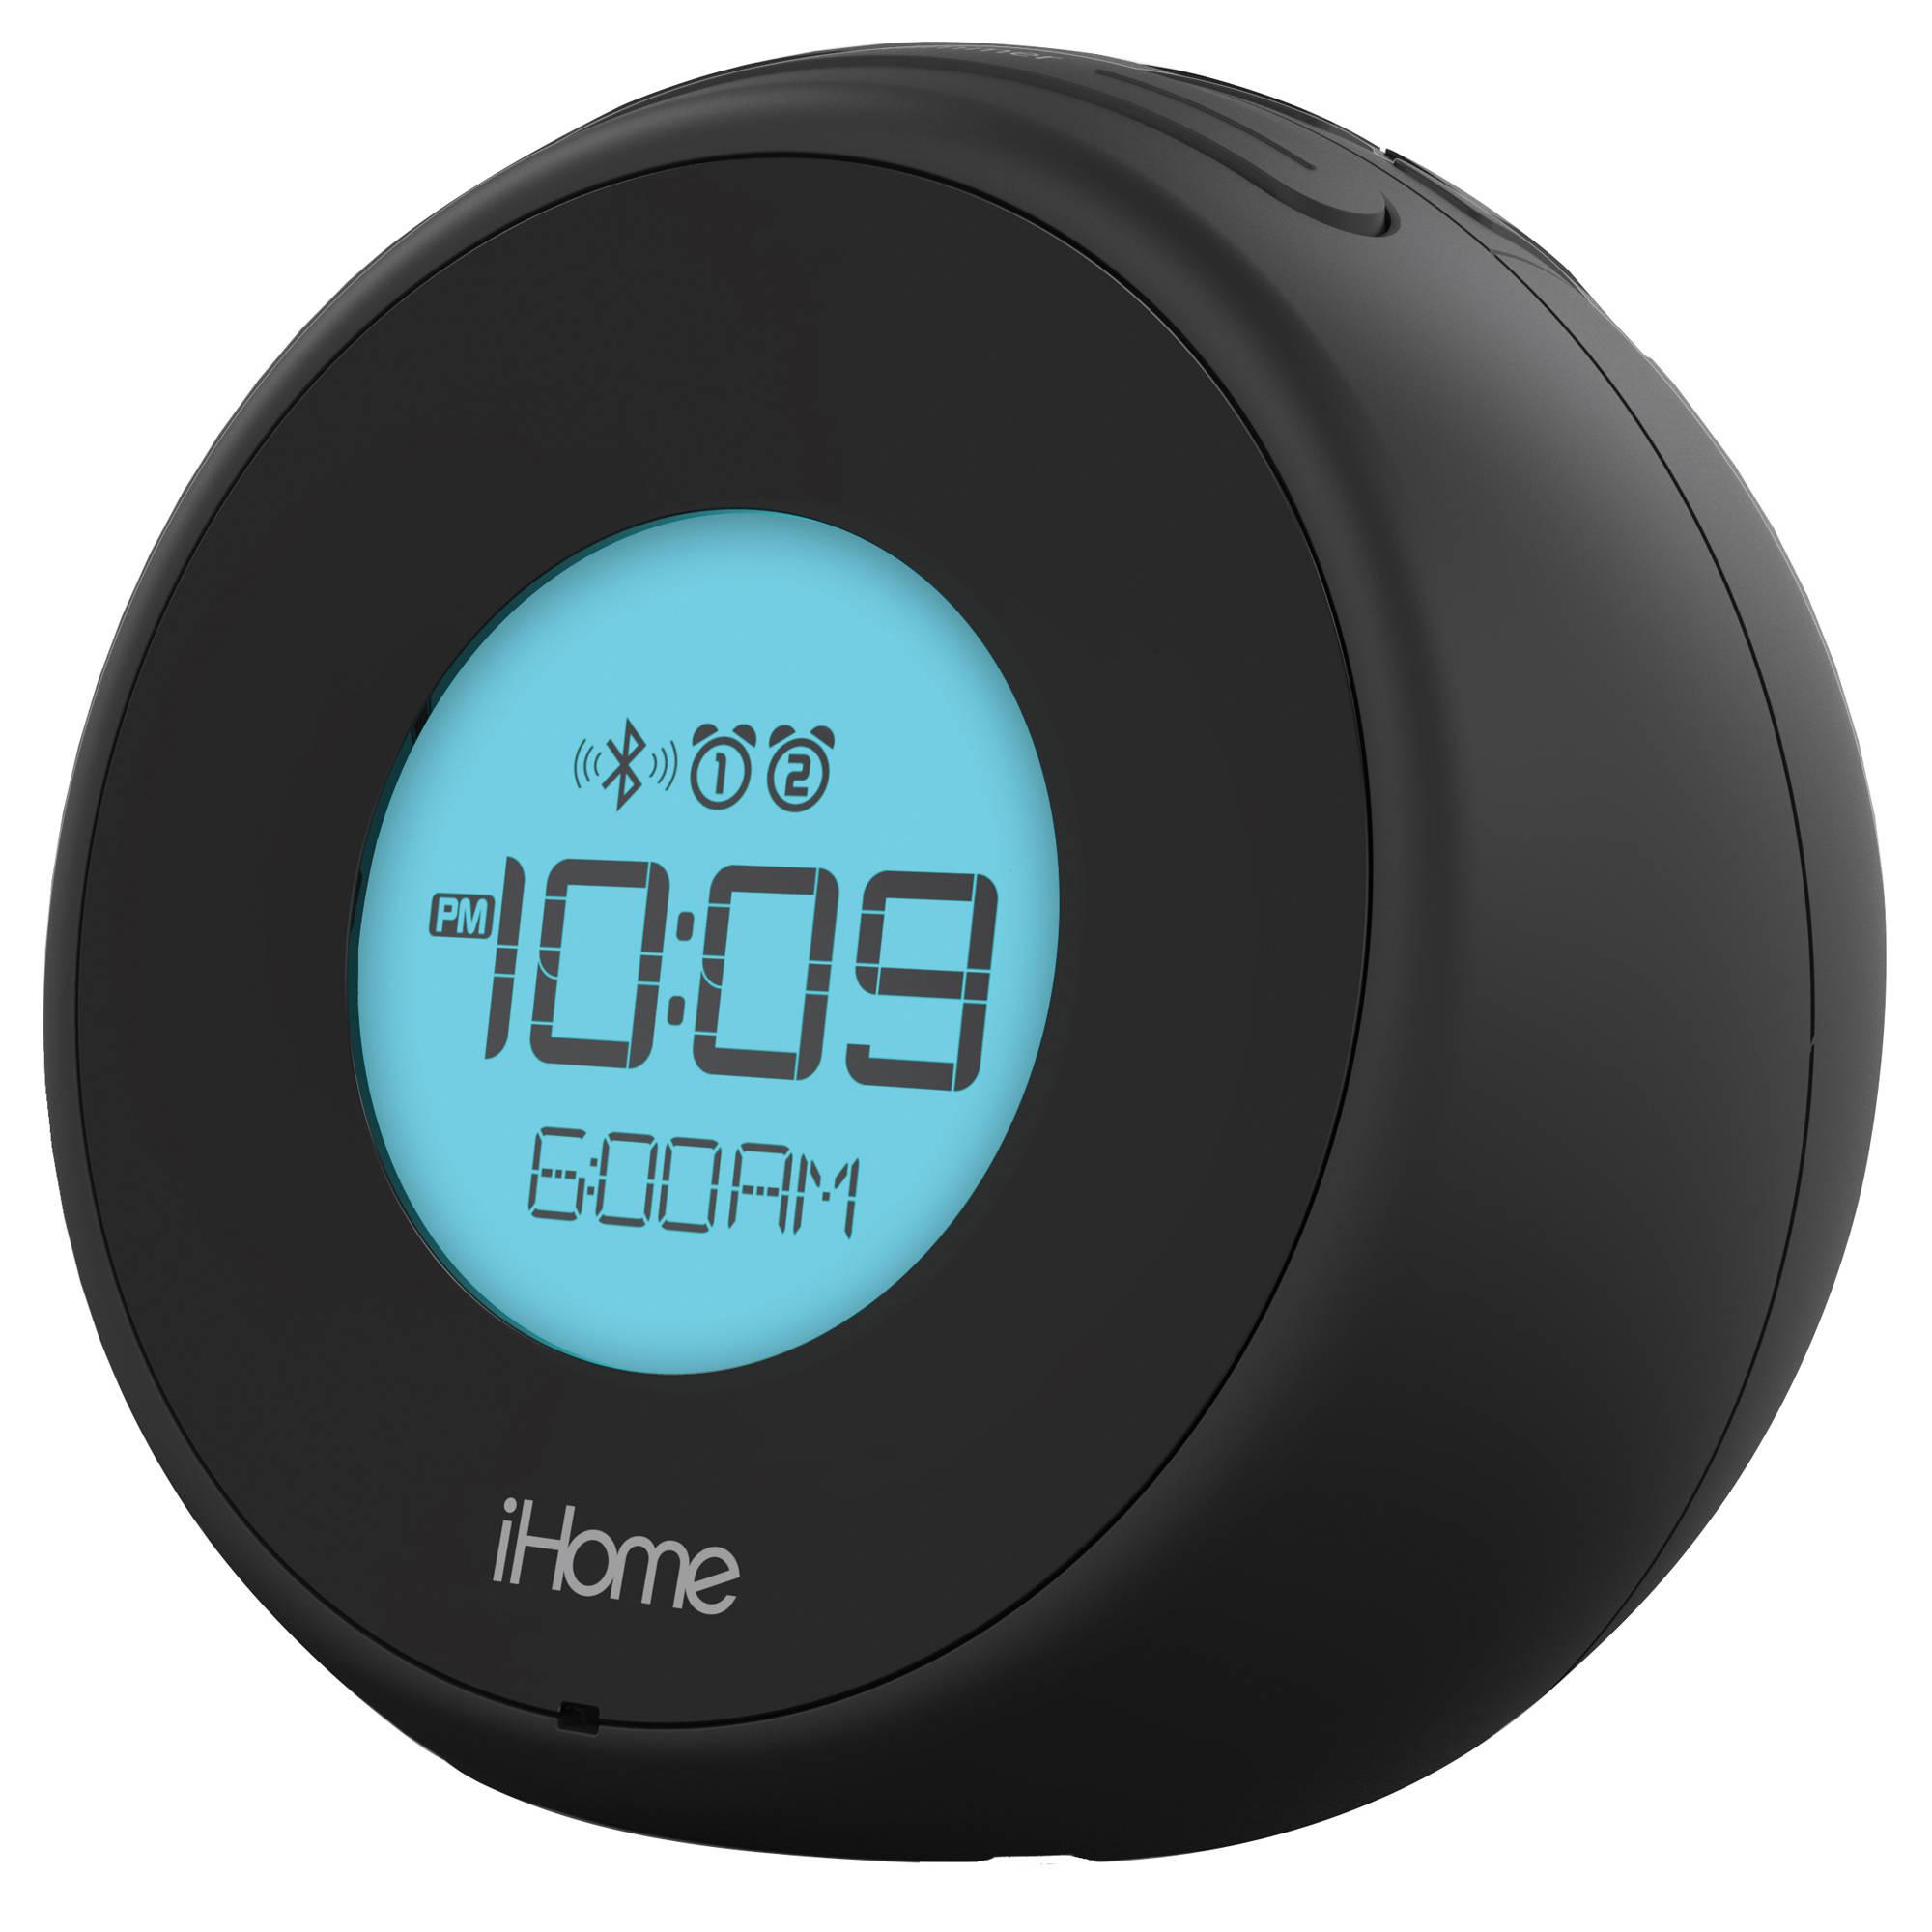 iHome iBT18 Bluetooth Alarm Clock IBT18BC B&H Photo Video